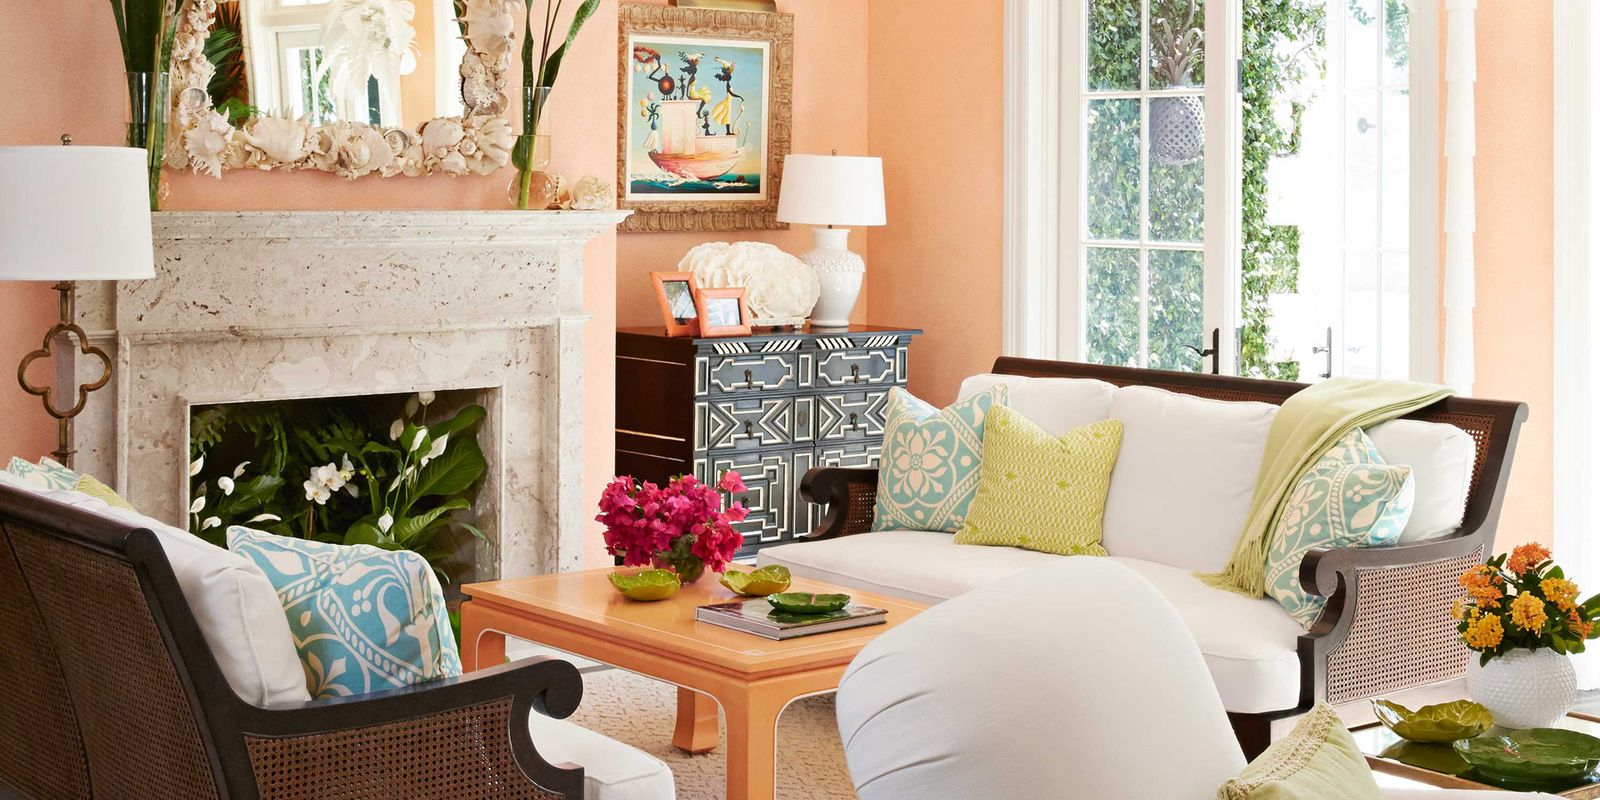 Ashley Furniture Signature Design Bedroom Set ~ Mimi McMakin and  1600 x 800